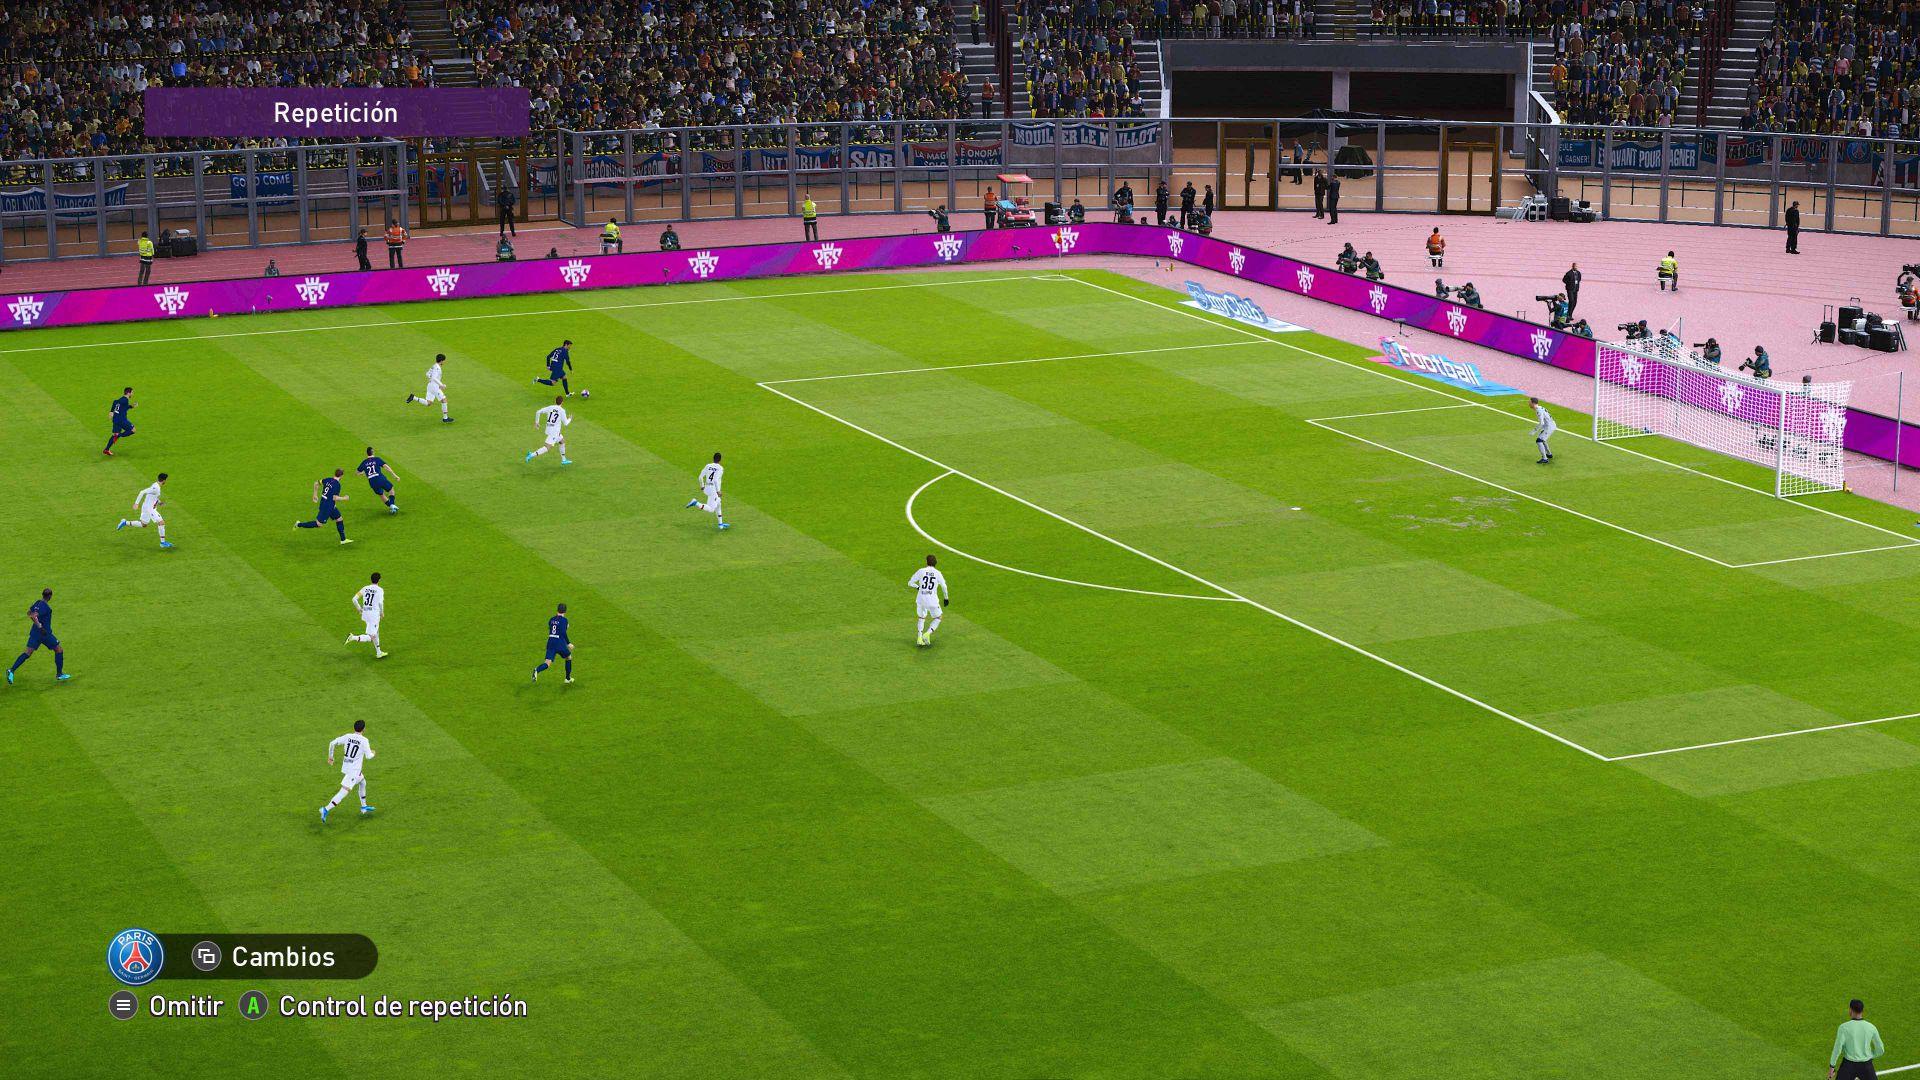 Análisis de eFootball PES 2020